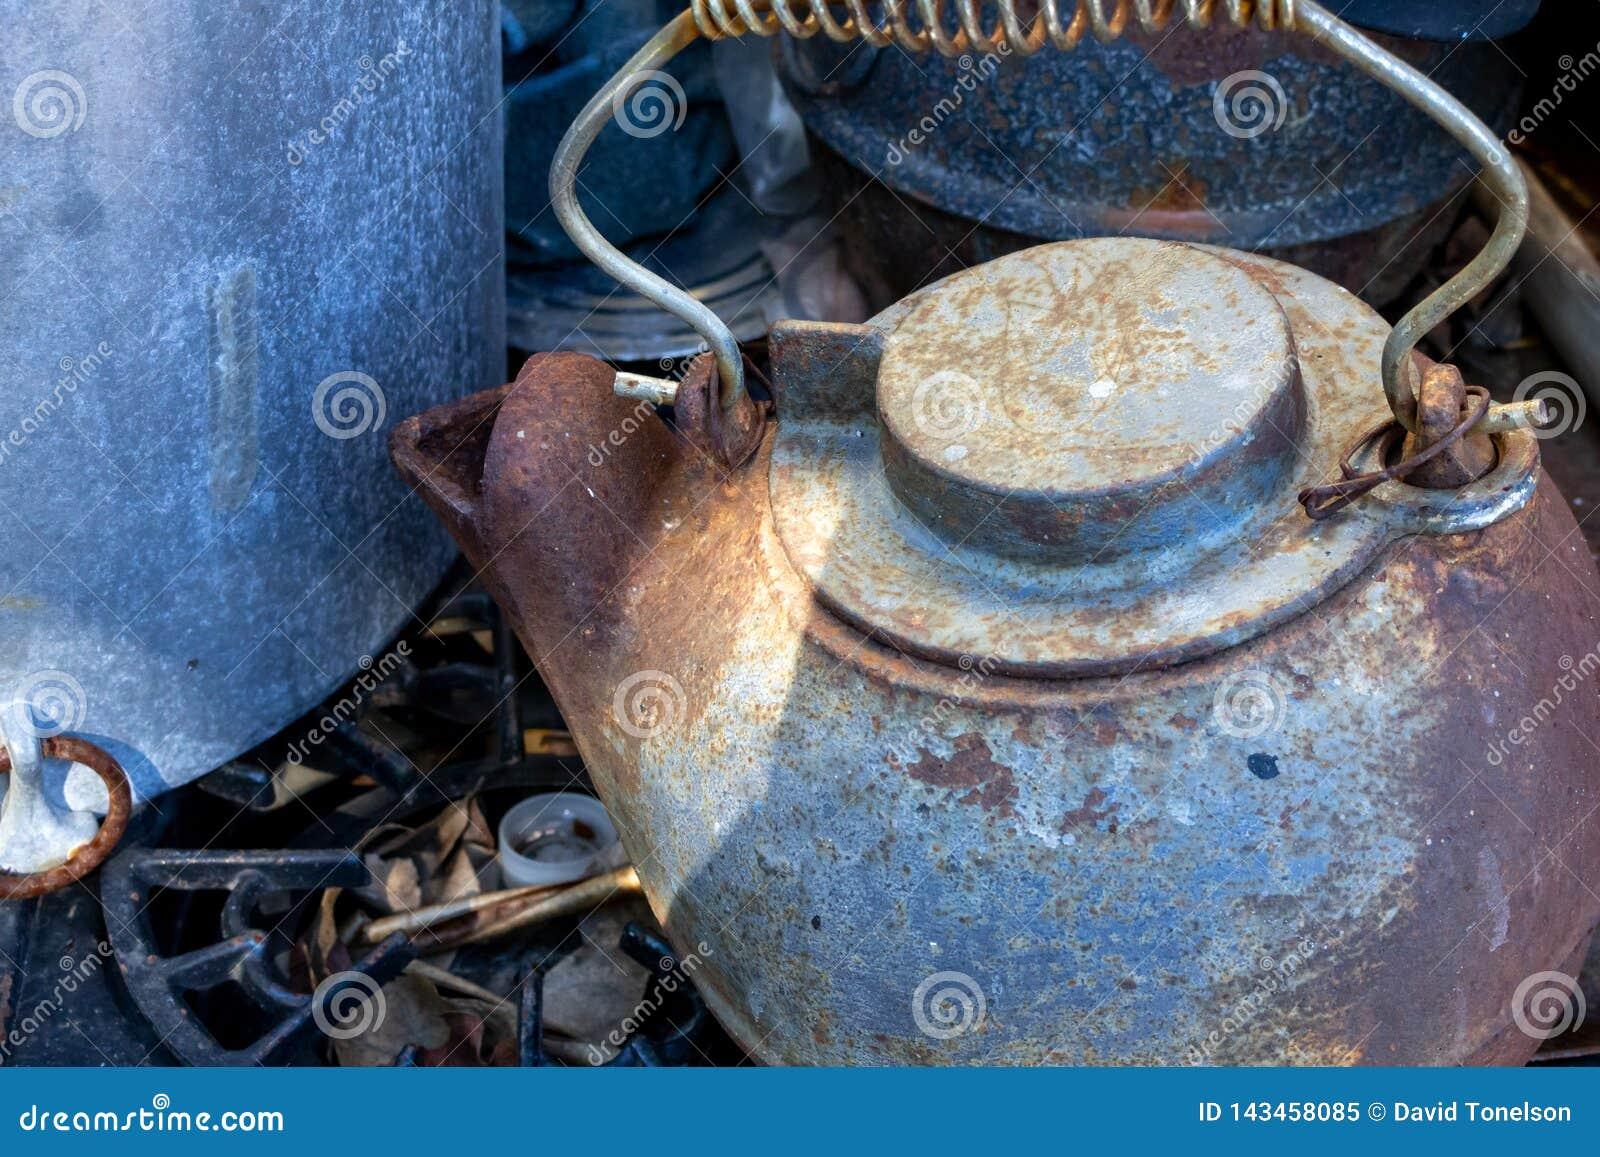 A vintage iron tea kettle